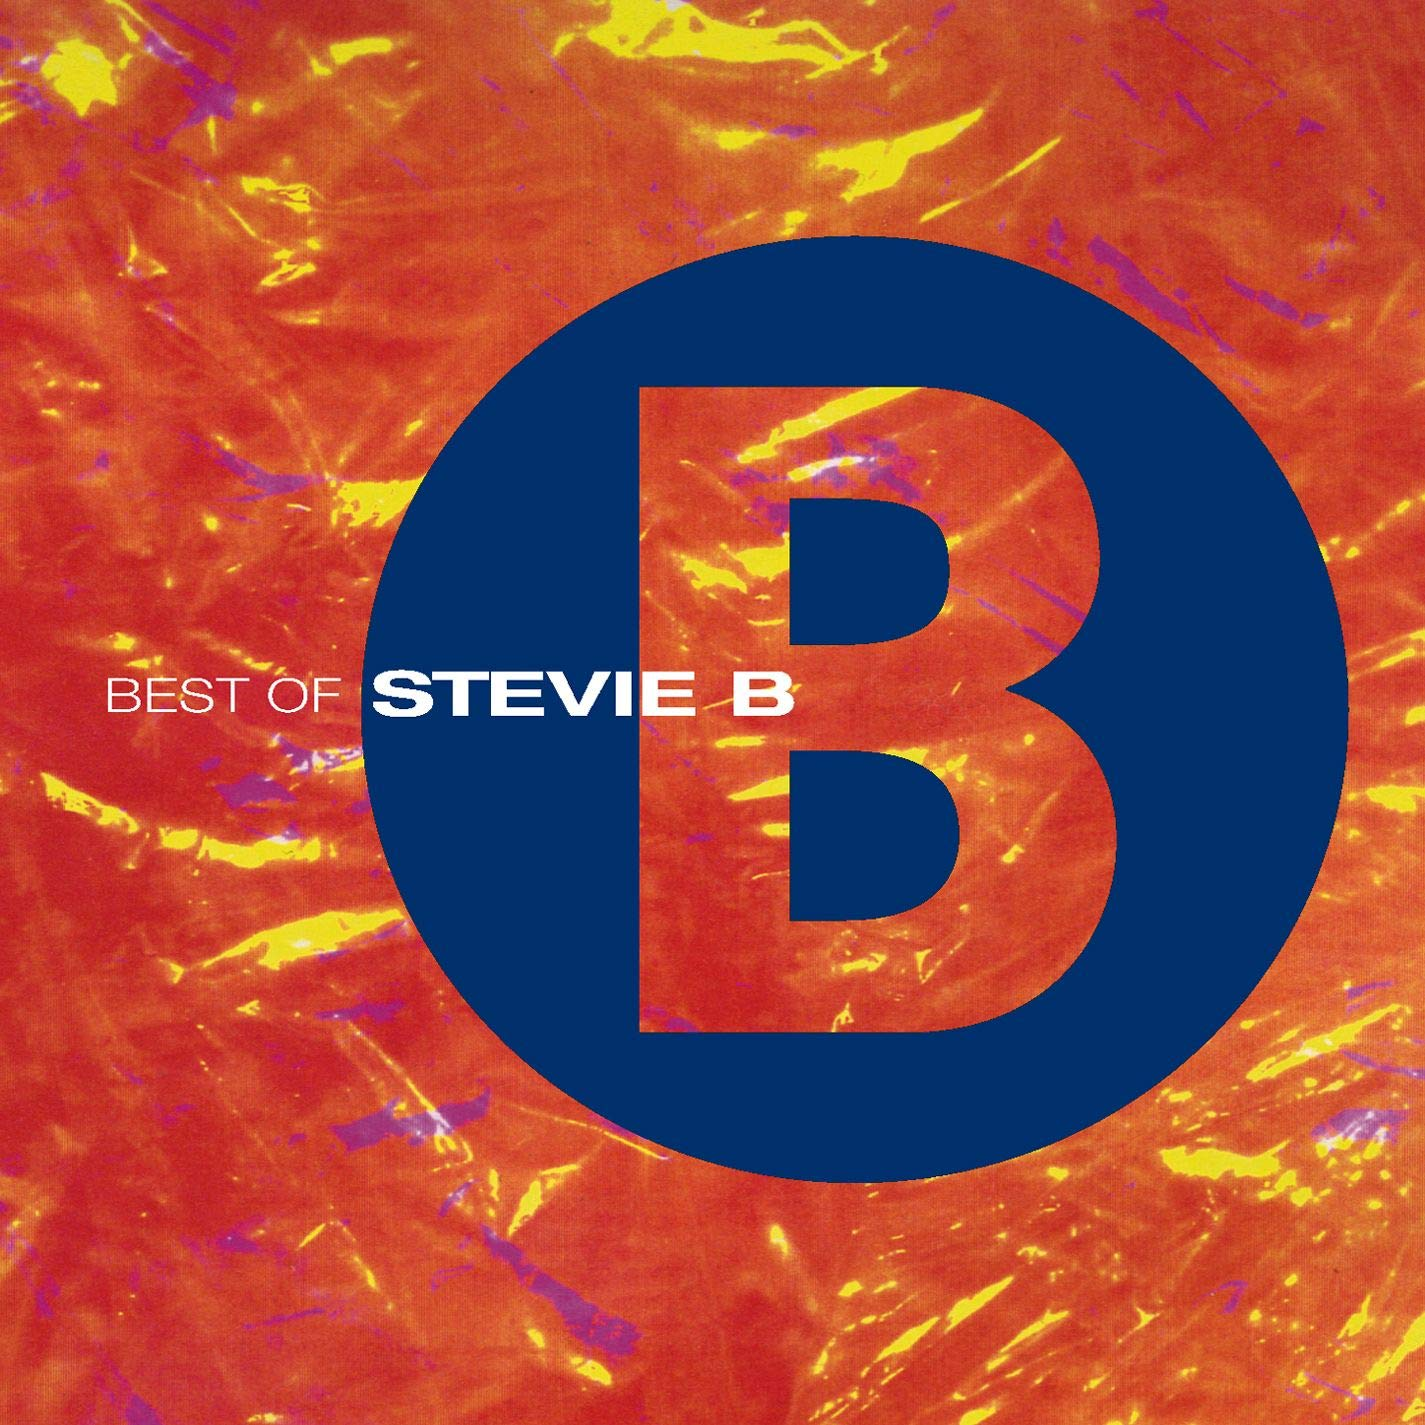 Best of: STEVIE B. by STEVIE B